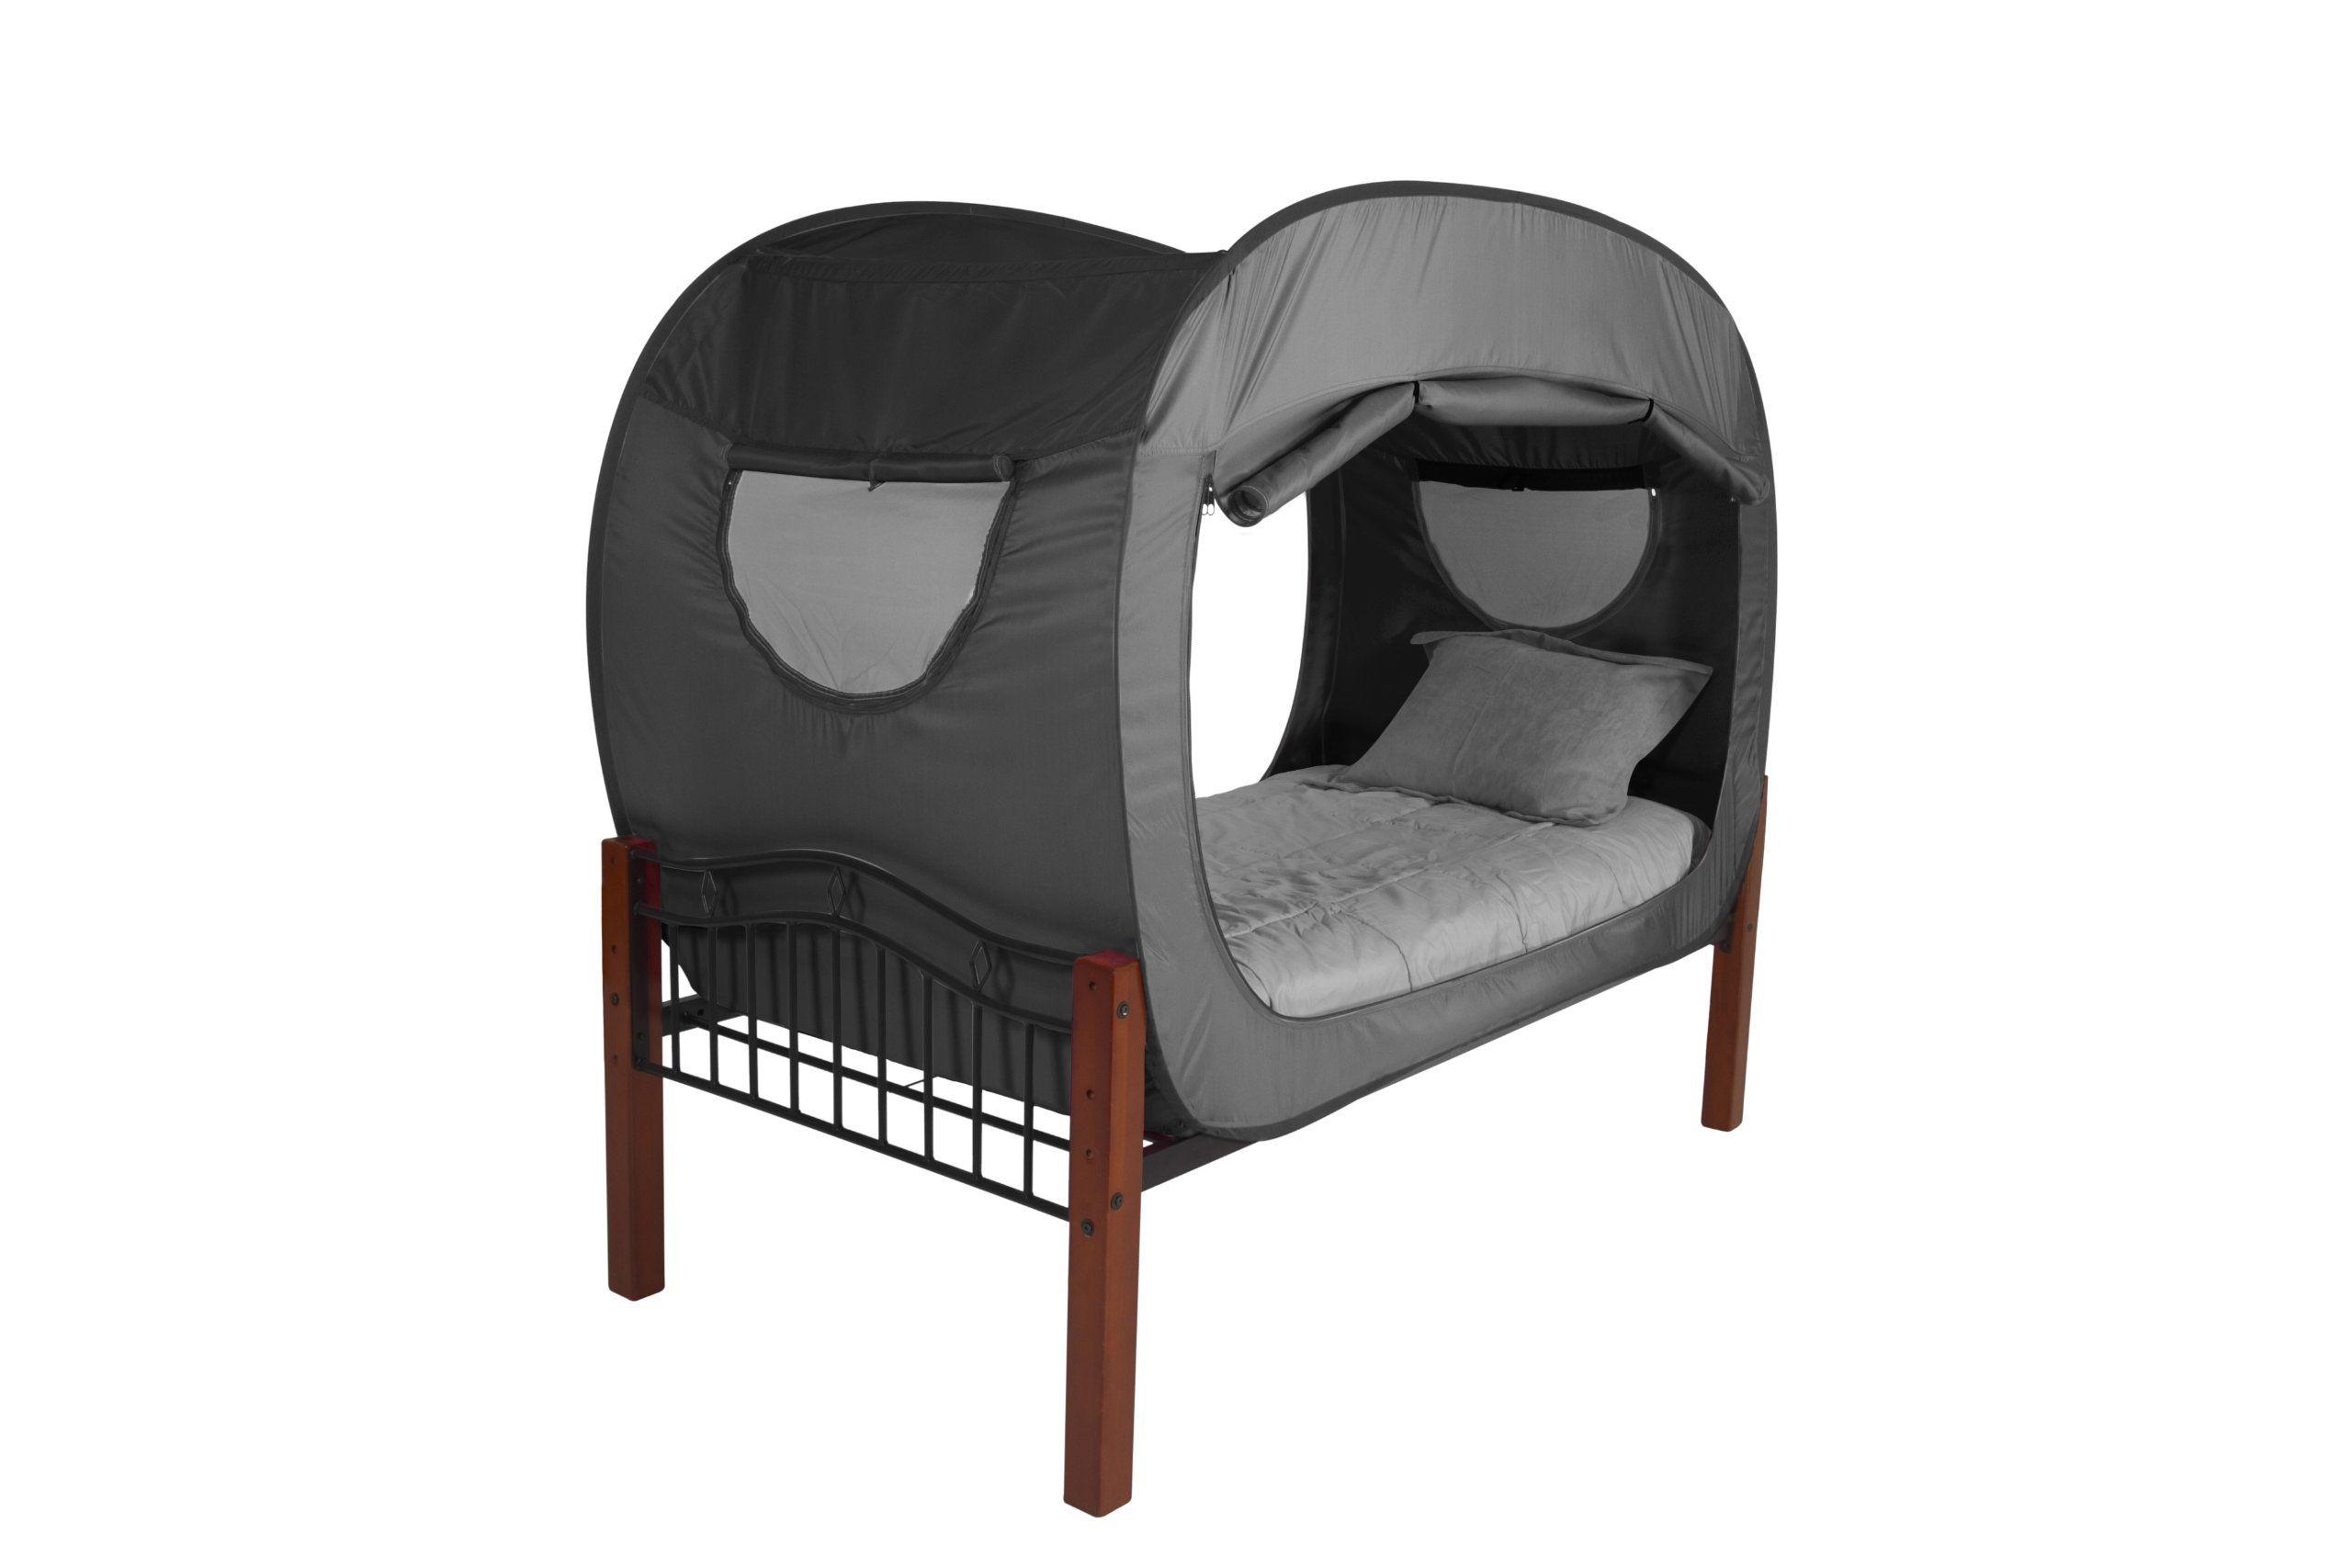 amazon: privacy pop bed tent: toys & games | random | pinterest